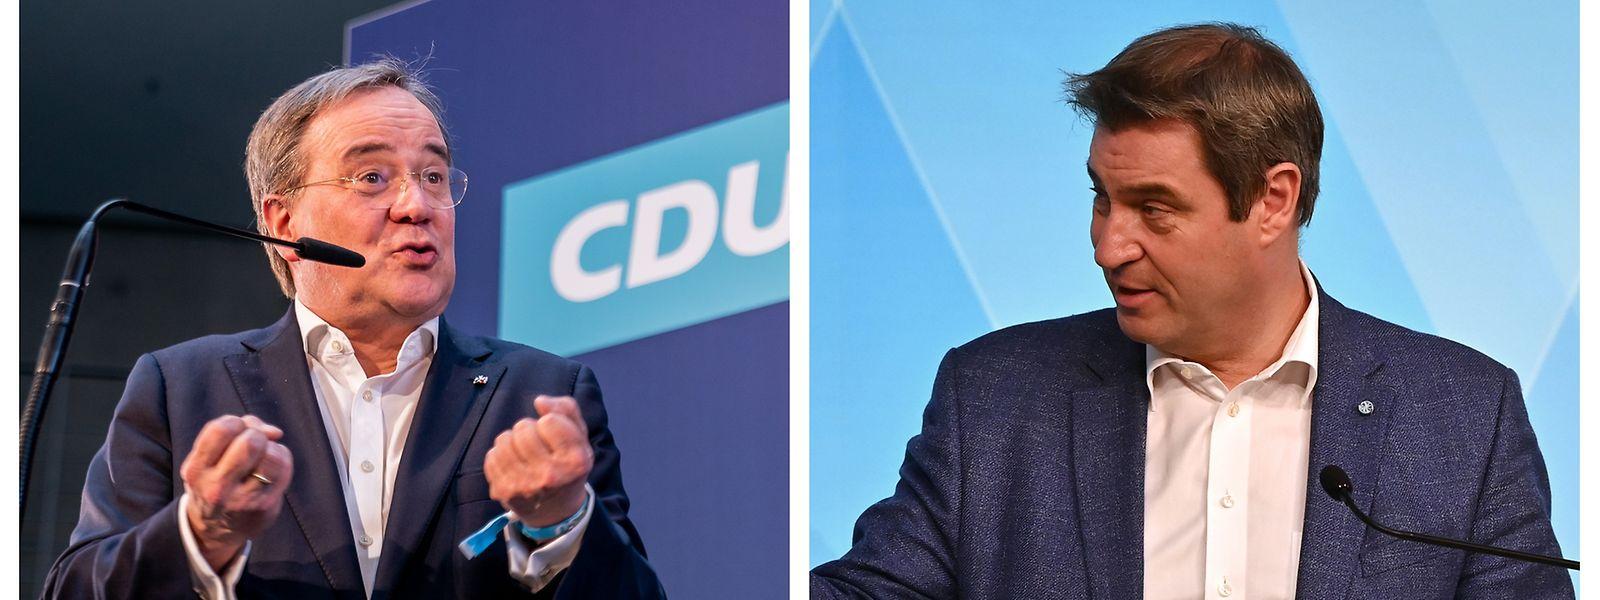 Der CDU-Bundesvorsitzende Armin Laschet tritt gegen den bayrischen Ministerpräsidenten Markus Söder an.